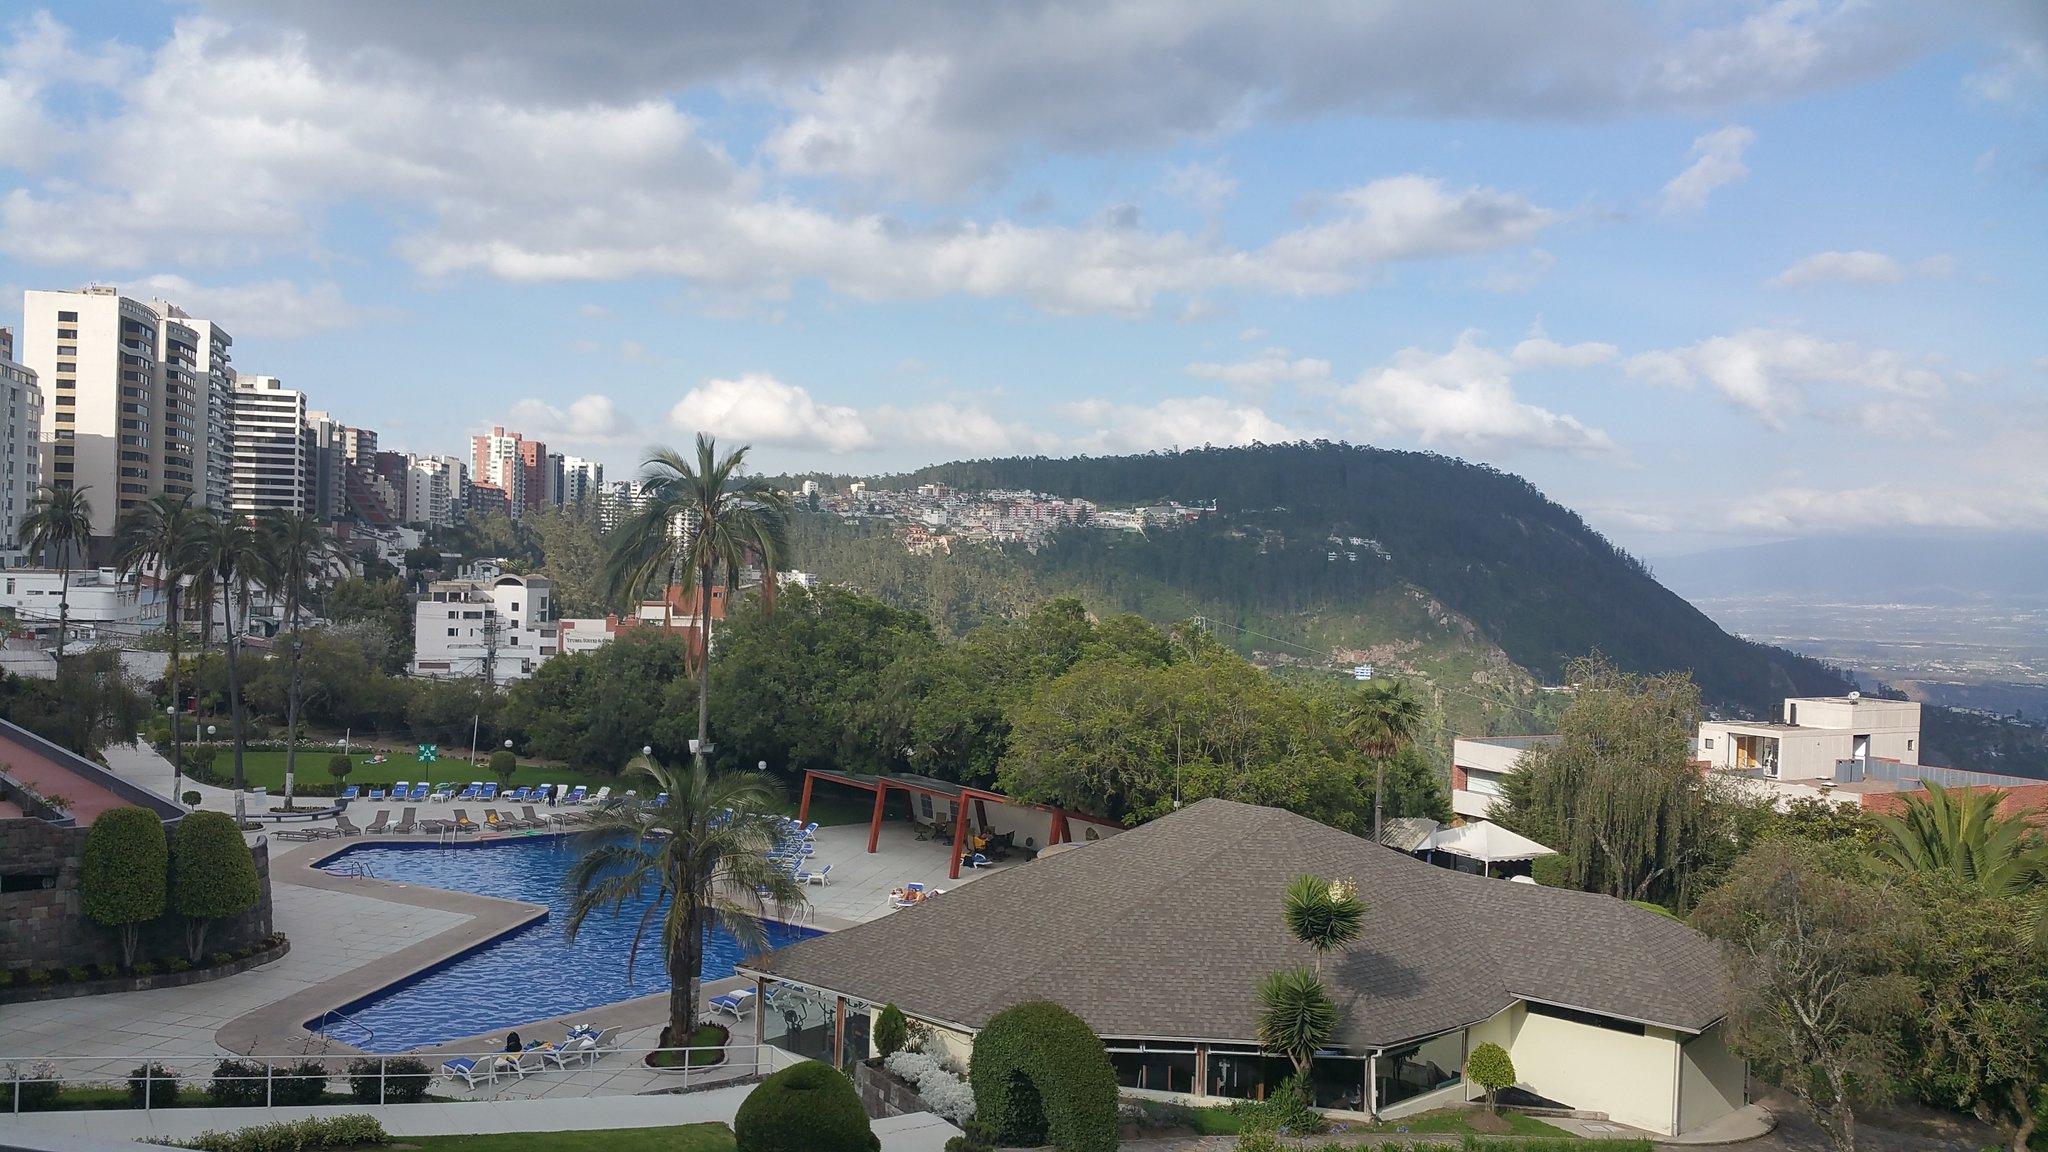 Hola Ecuador! #GPPEc16 @GPPVT https://t.co/zYs8Bi5aMz